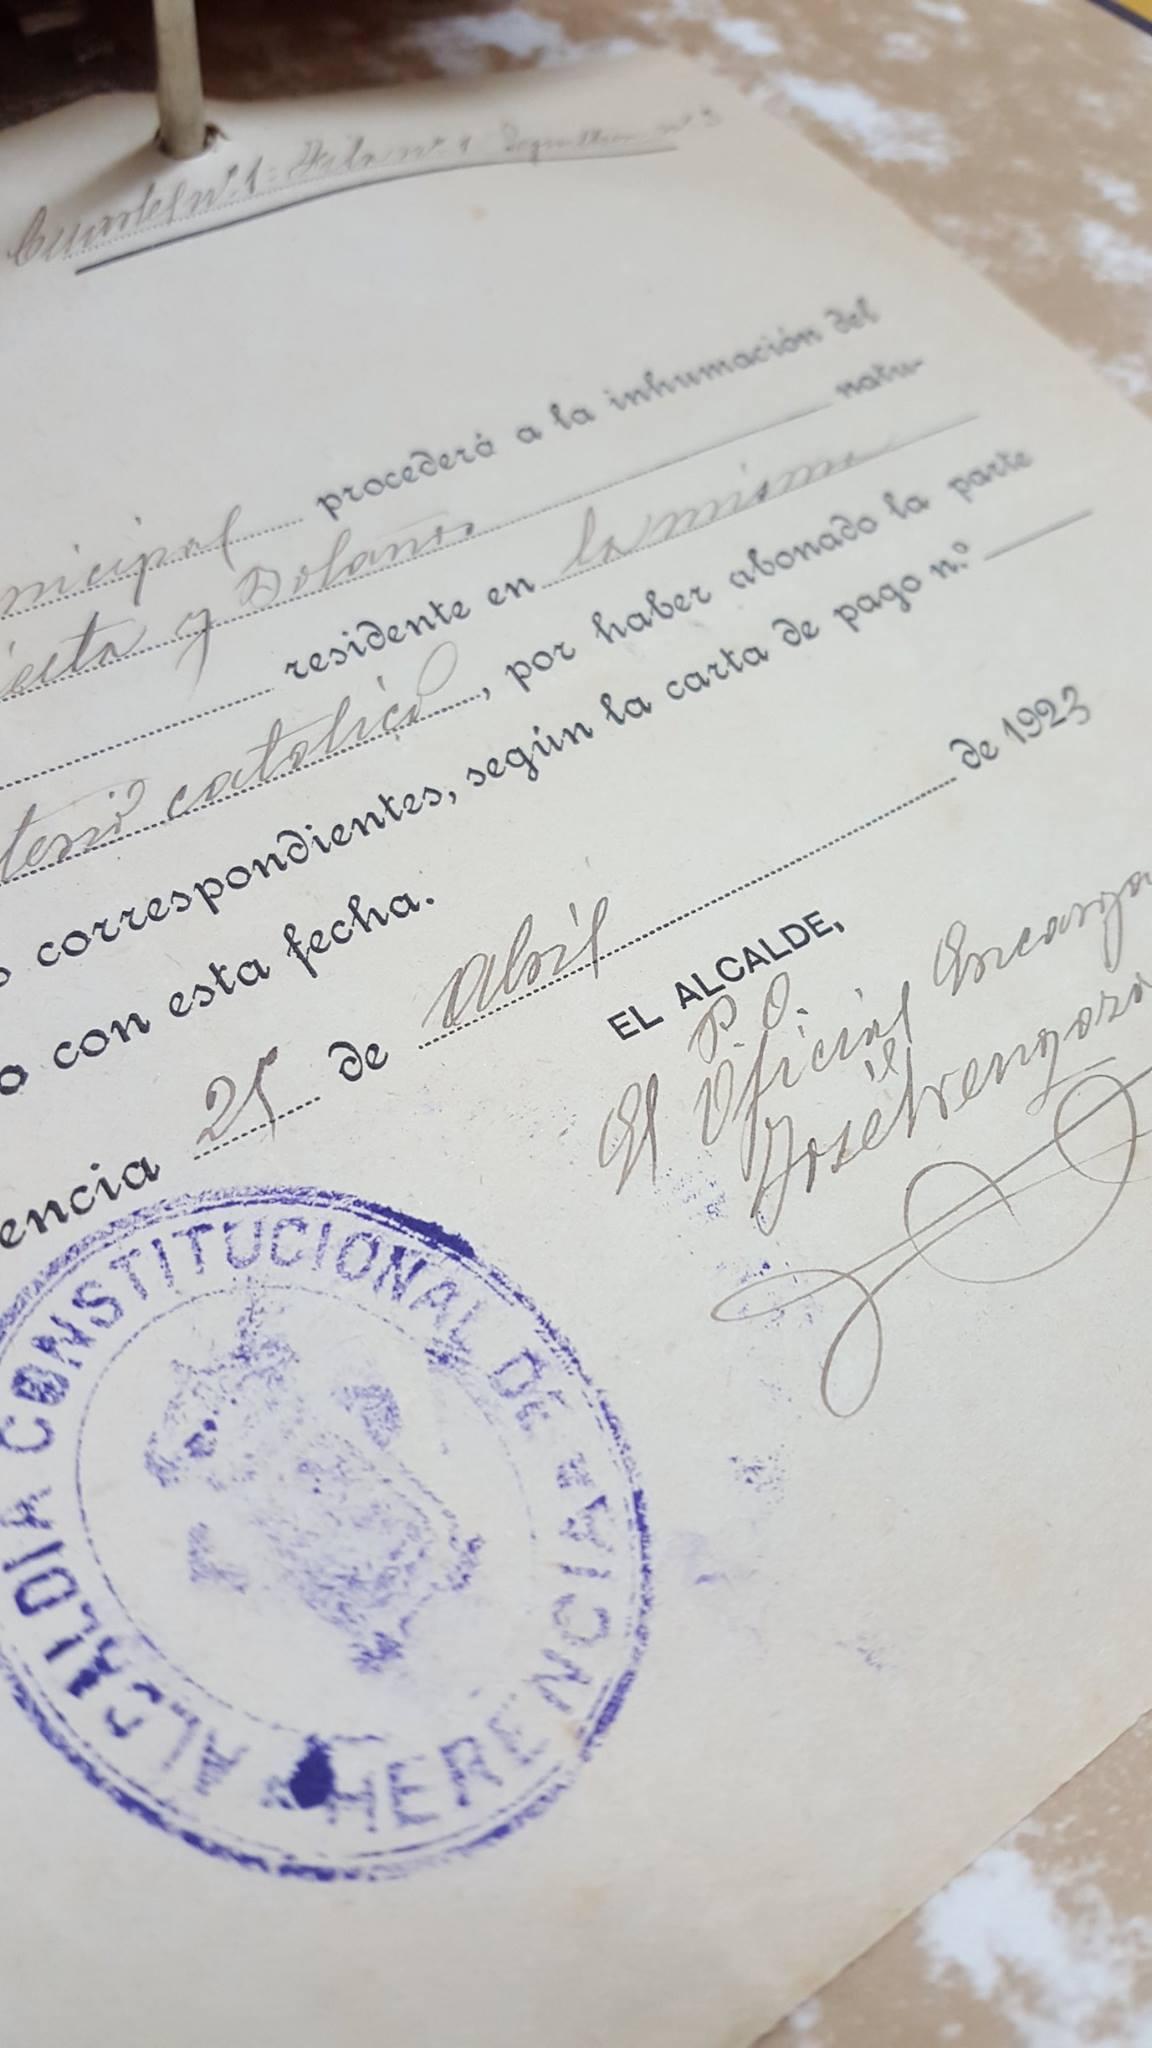 documento del patrimonio documental historico de herencia - Cuidando el patrimonio documental del municipio